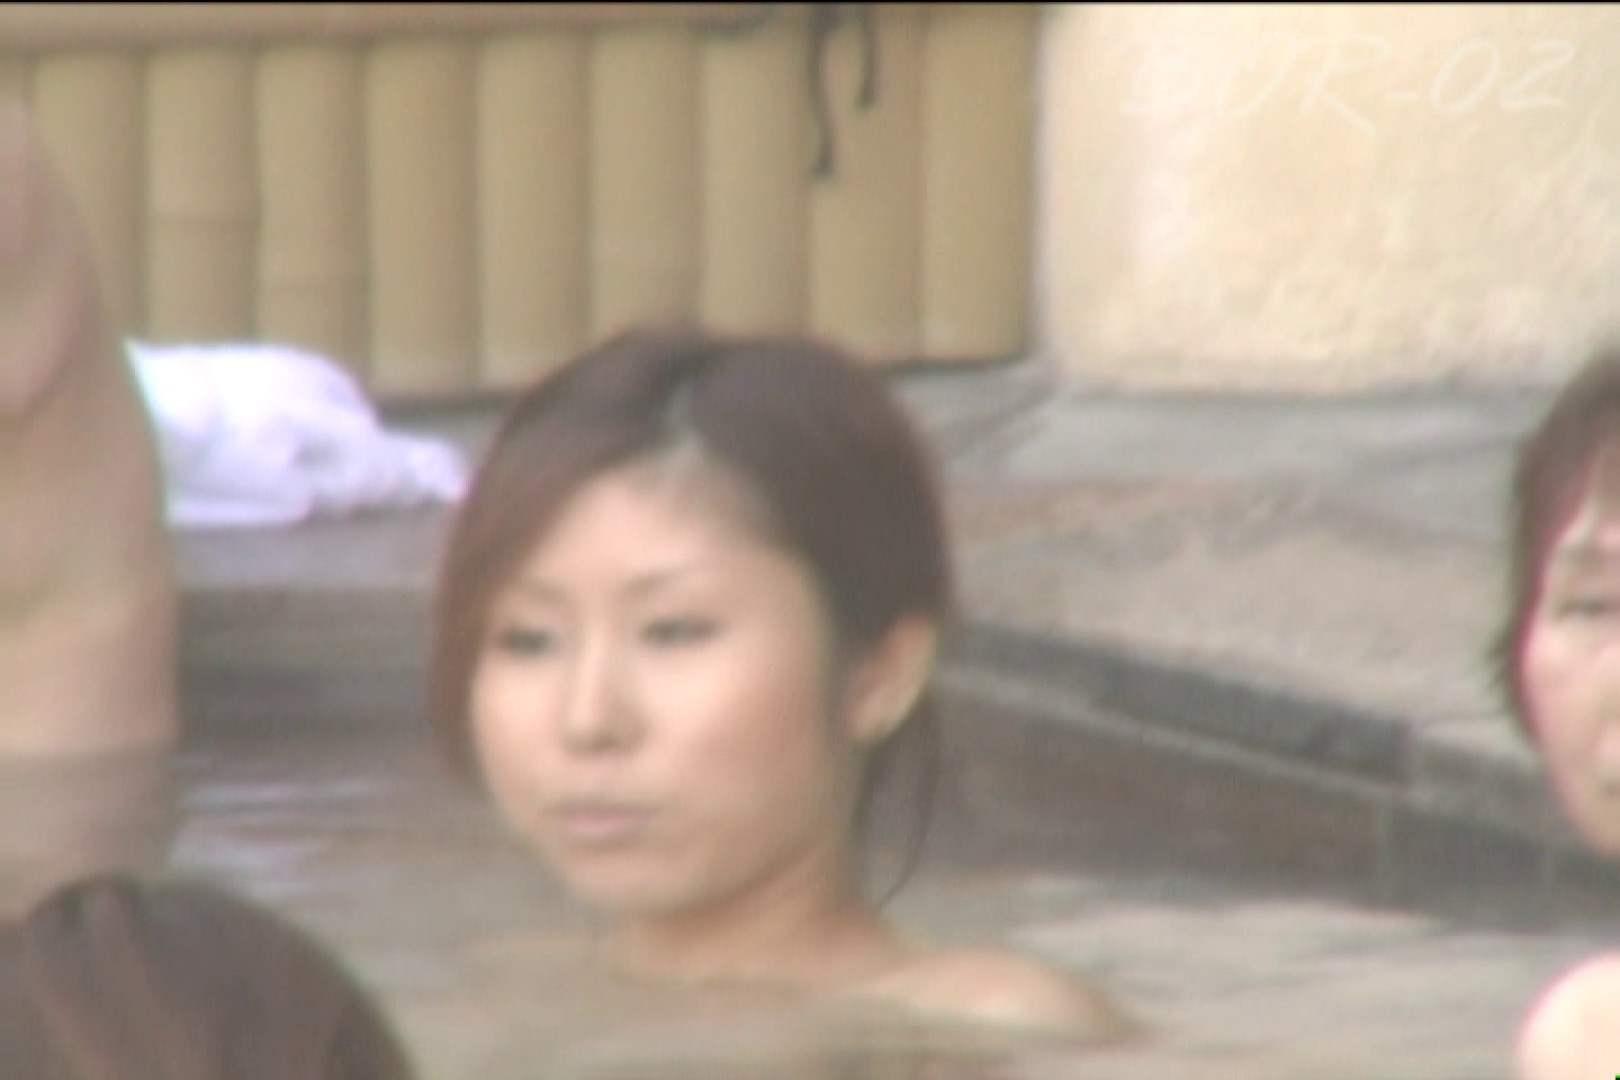 Aquaな露天風呂Vol.477 露天 アダルト動画キャプチャ 99PICs 17